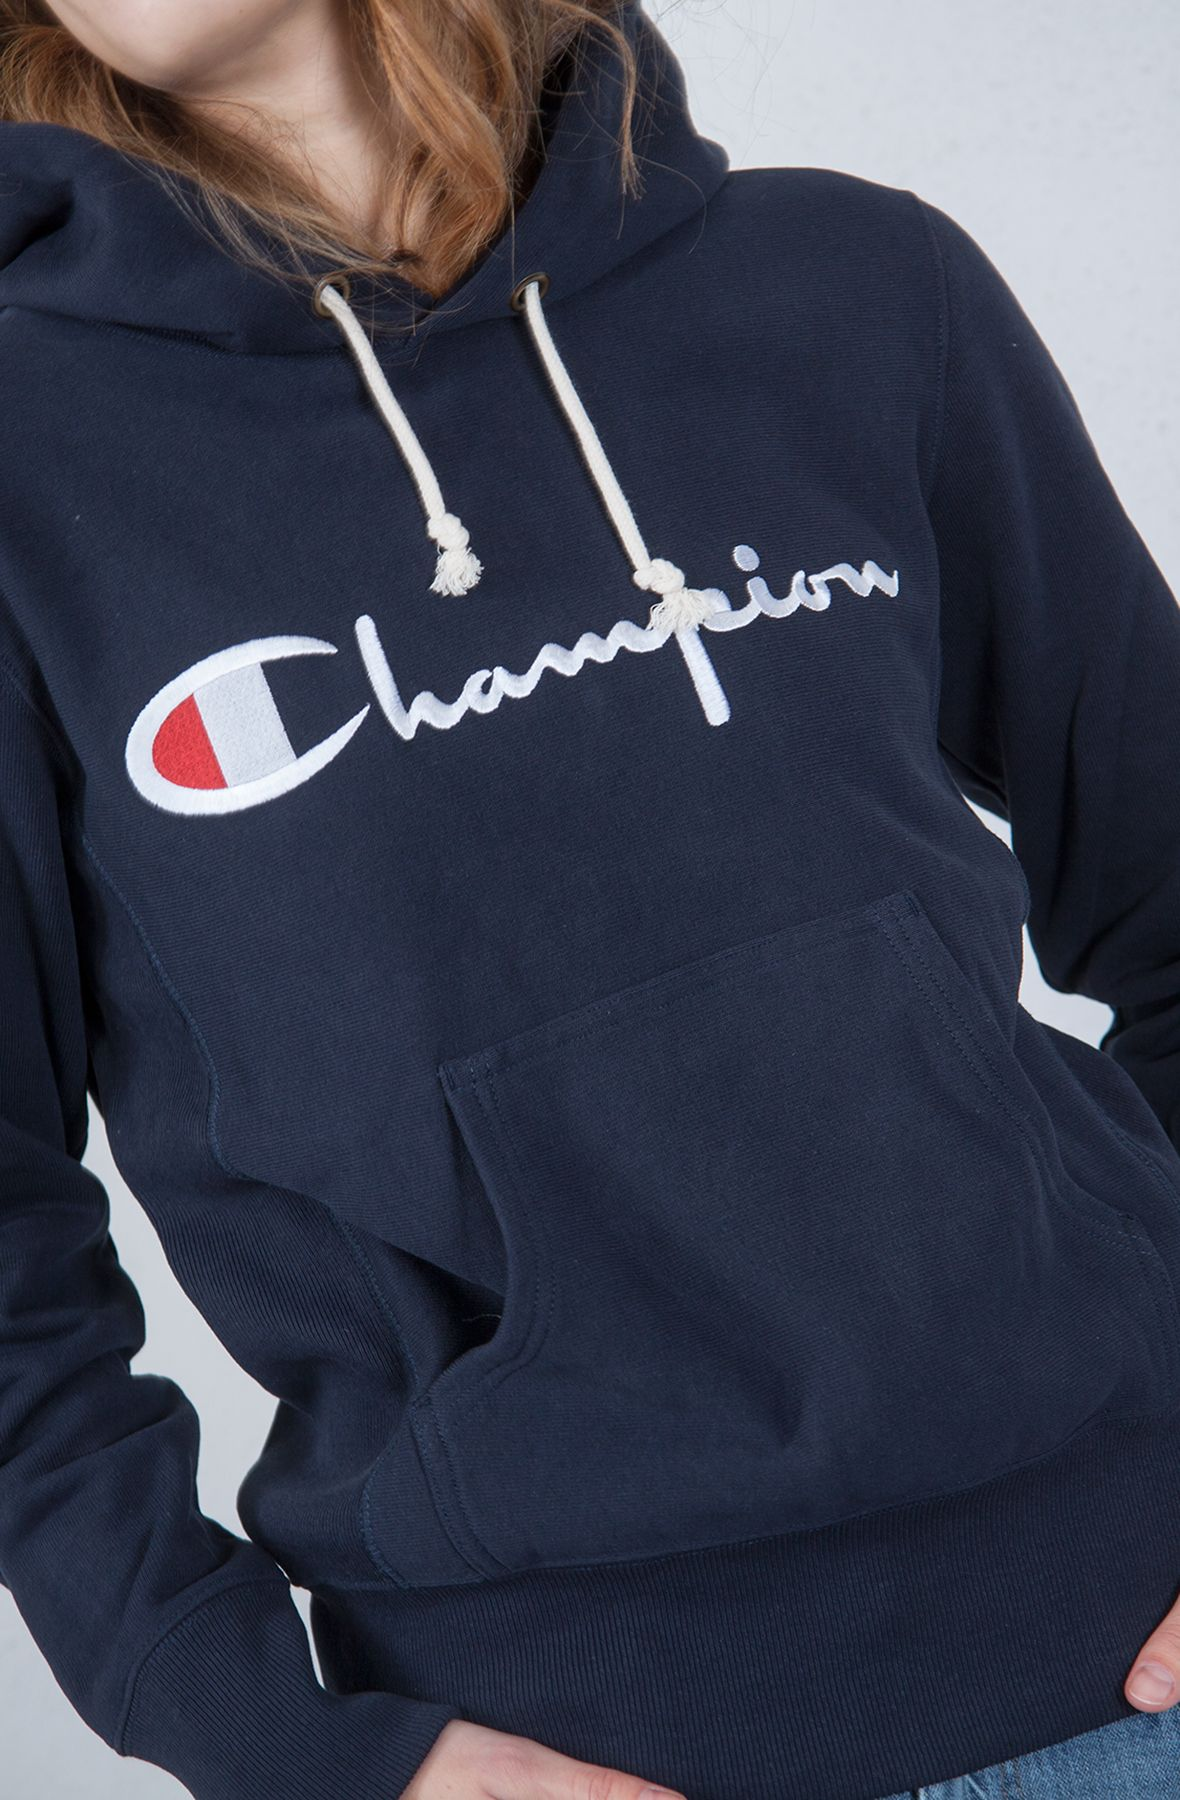 dba6be7b champion, champion official, champion clothing, champion outfit, champion  outwear, champion sweater, champion sweatshirt, champion hoodie, champion  hood, ...